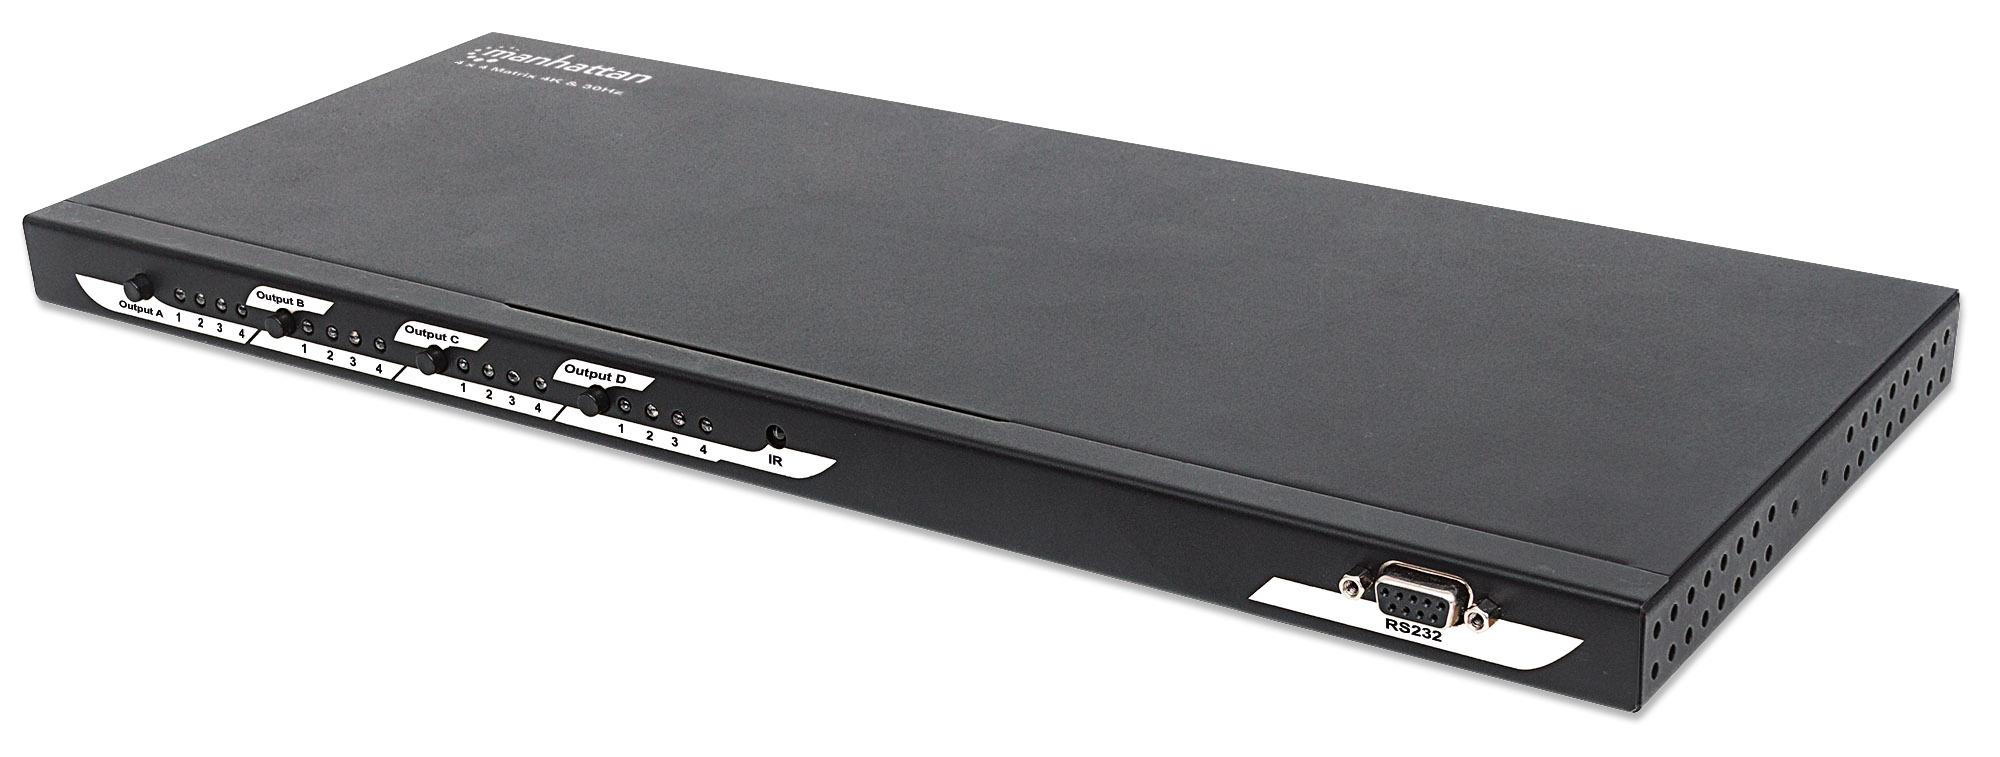 4K 4x4 HDMI Matrix